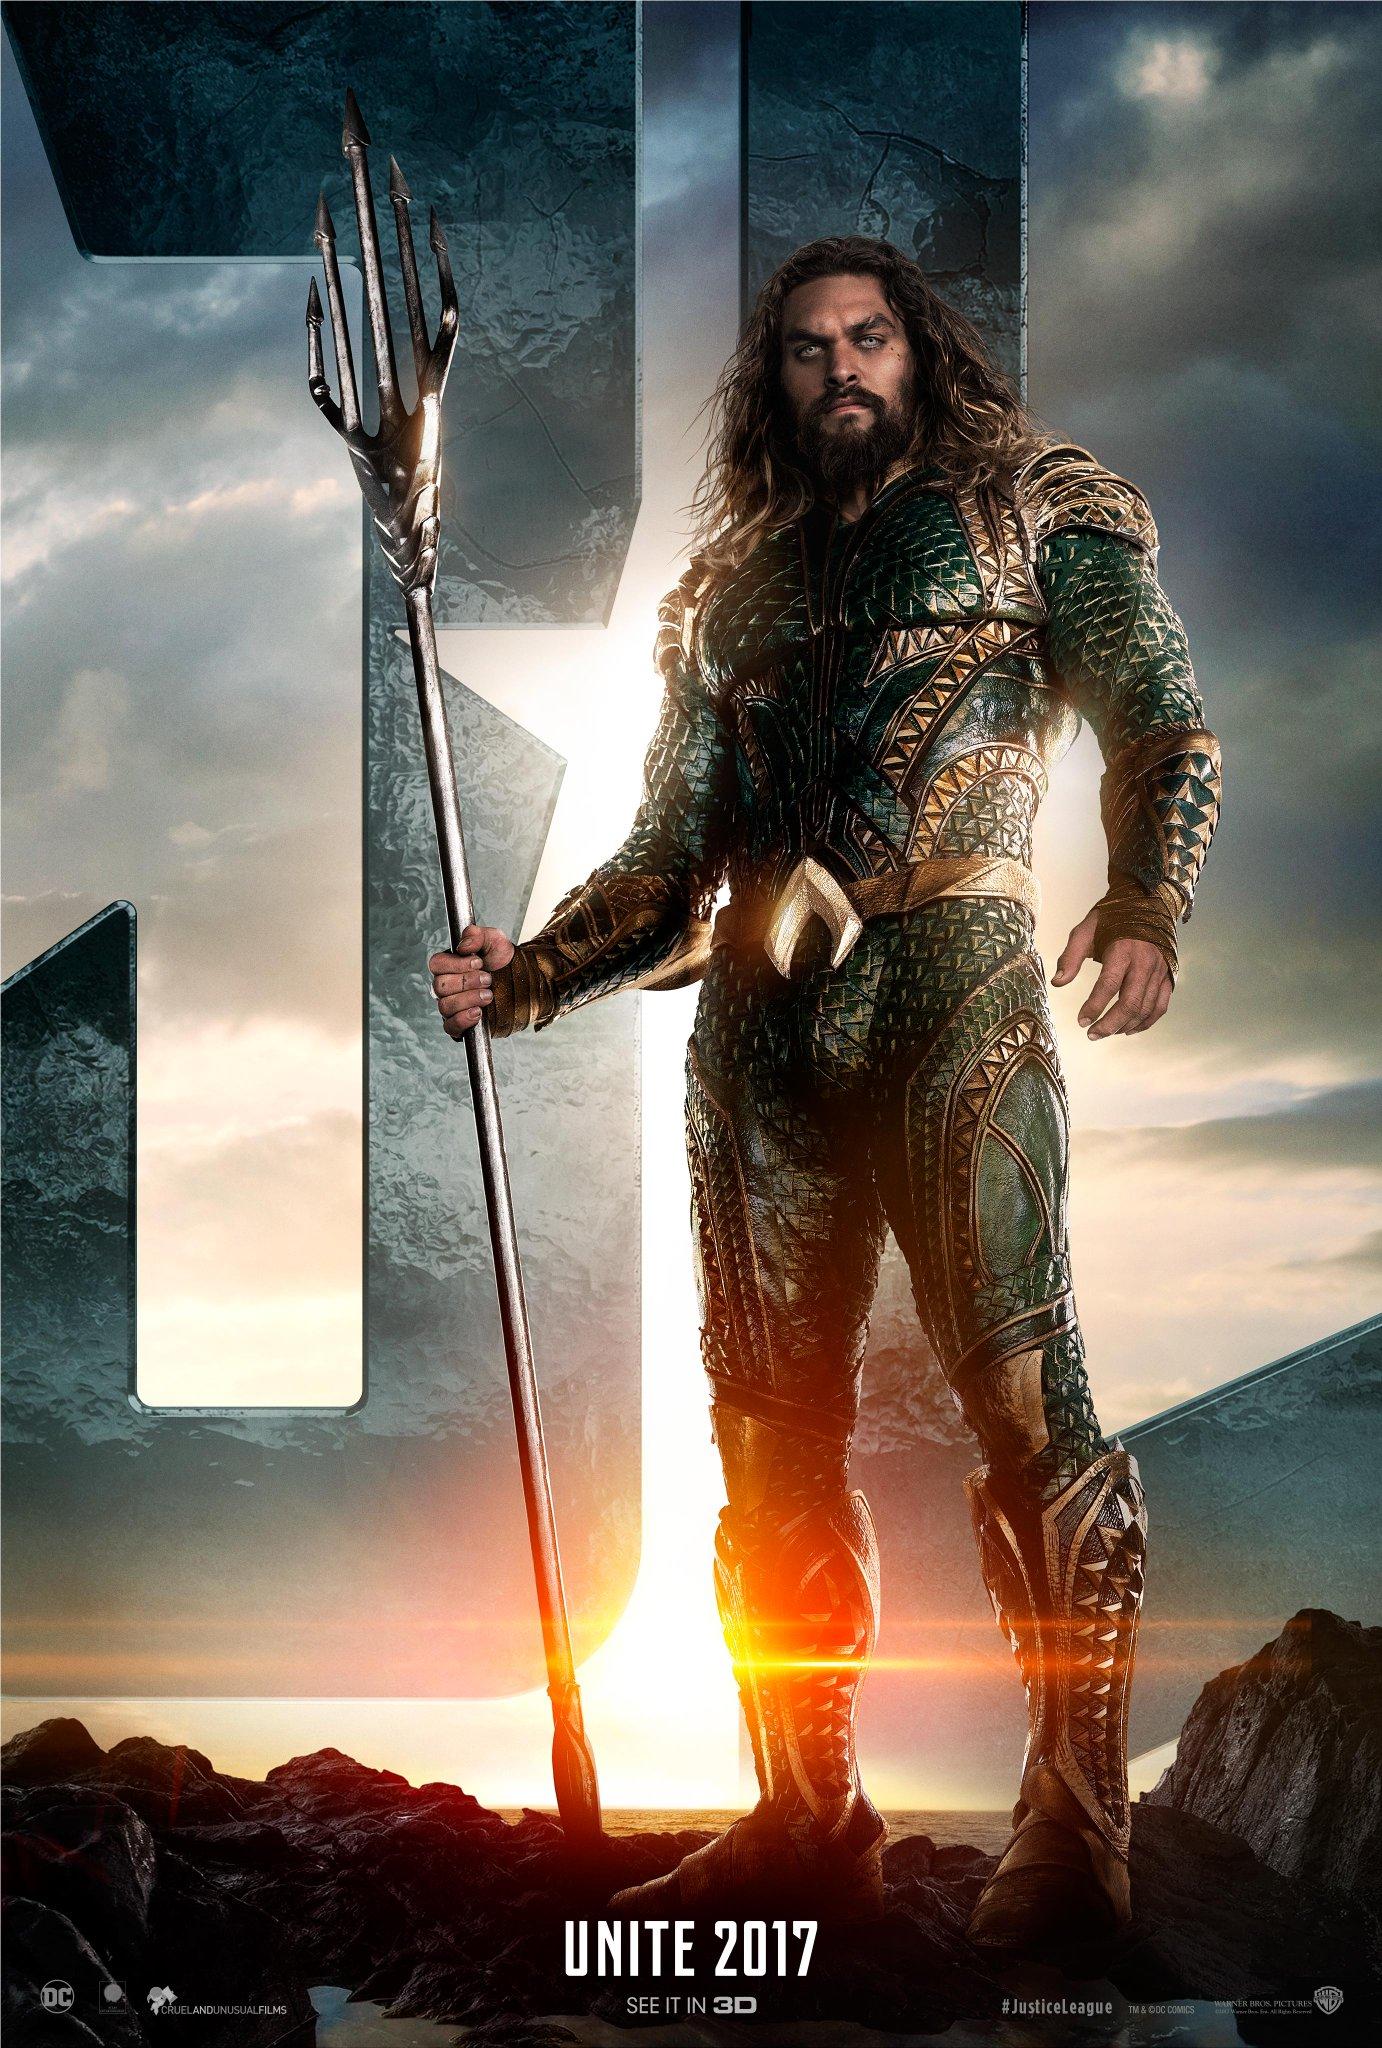 Justice League Trailer Aquaman Poster